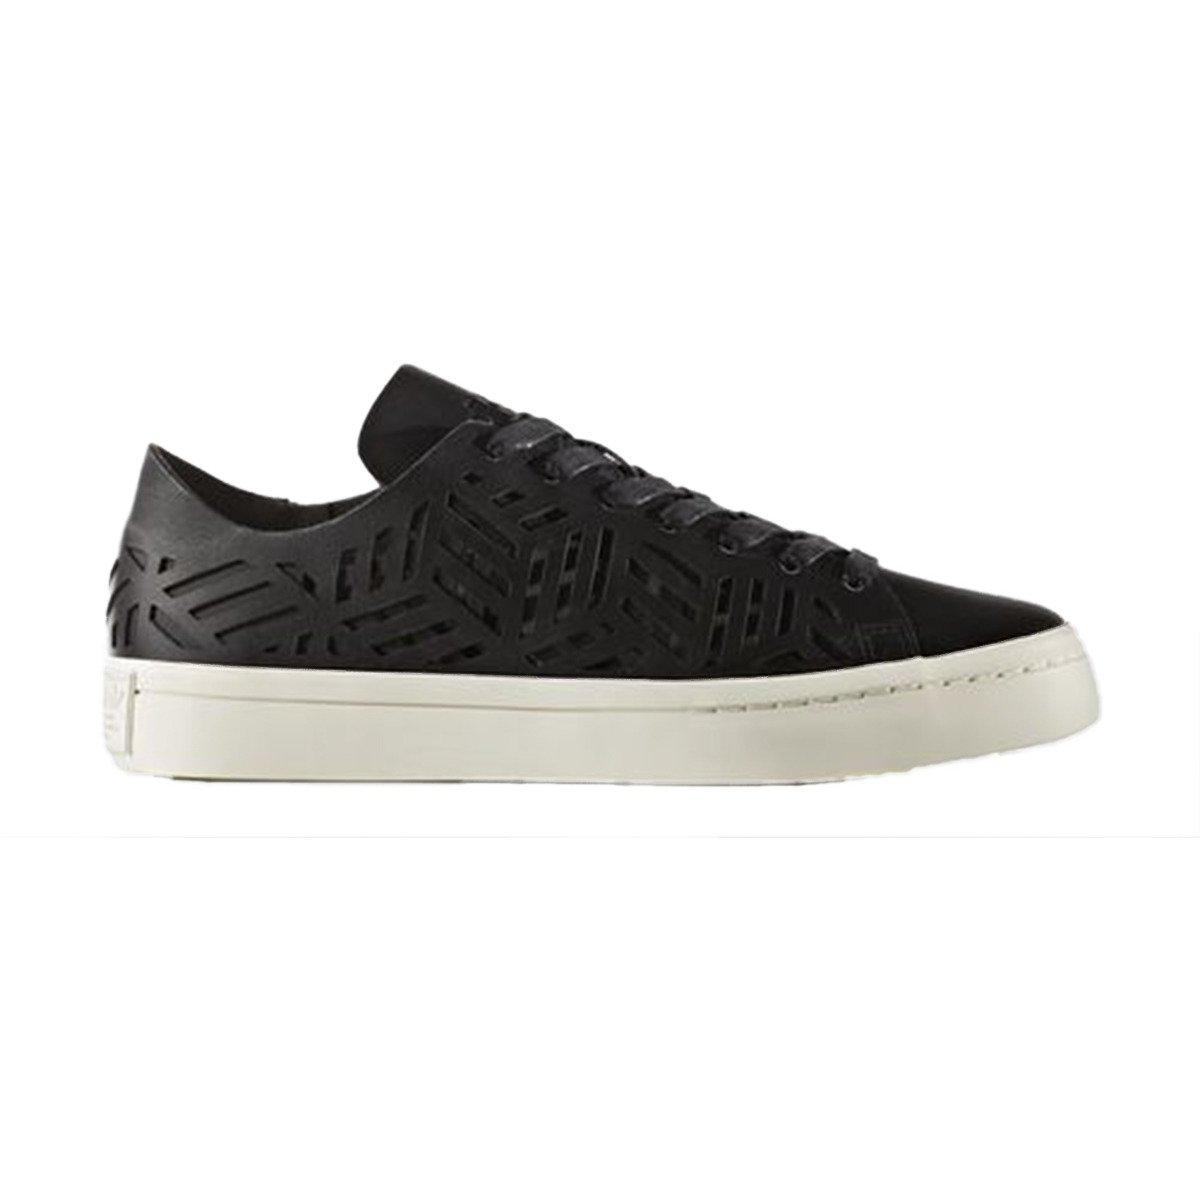 Adidas Courtvantage Schuhe BY2956 Basketballschuhe